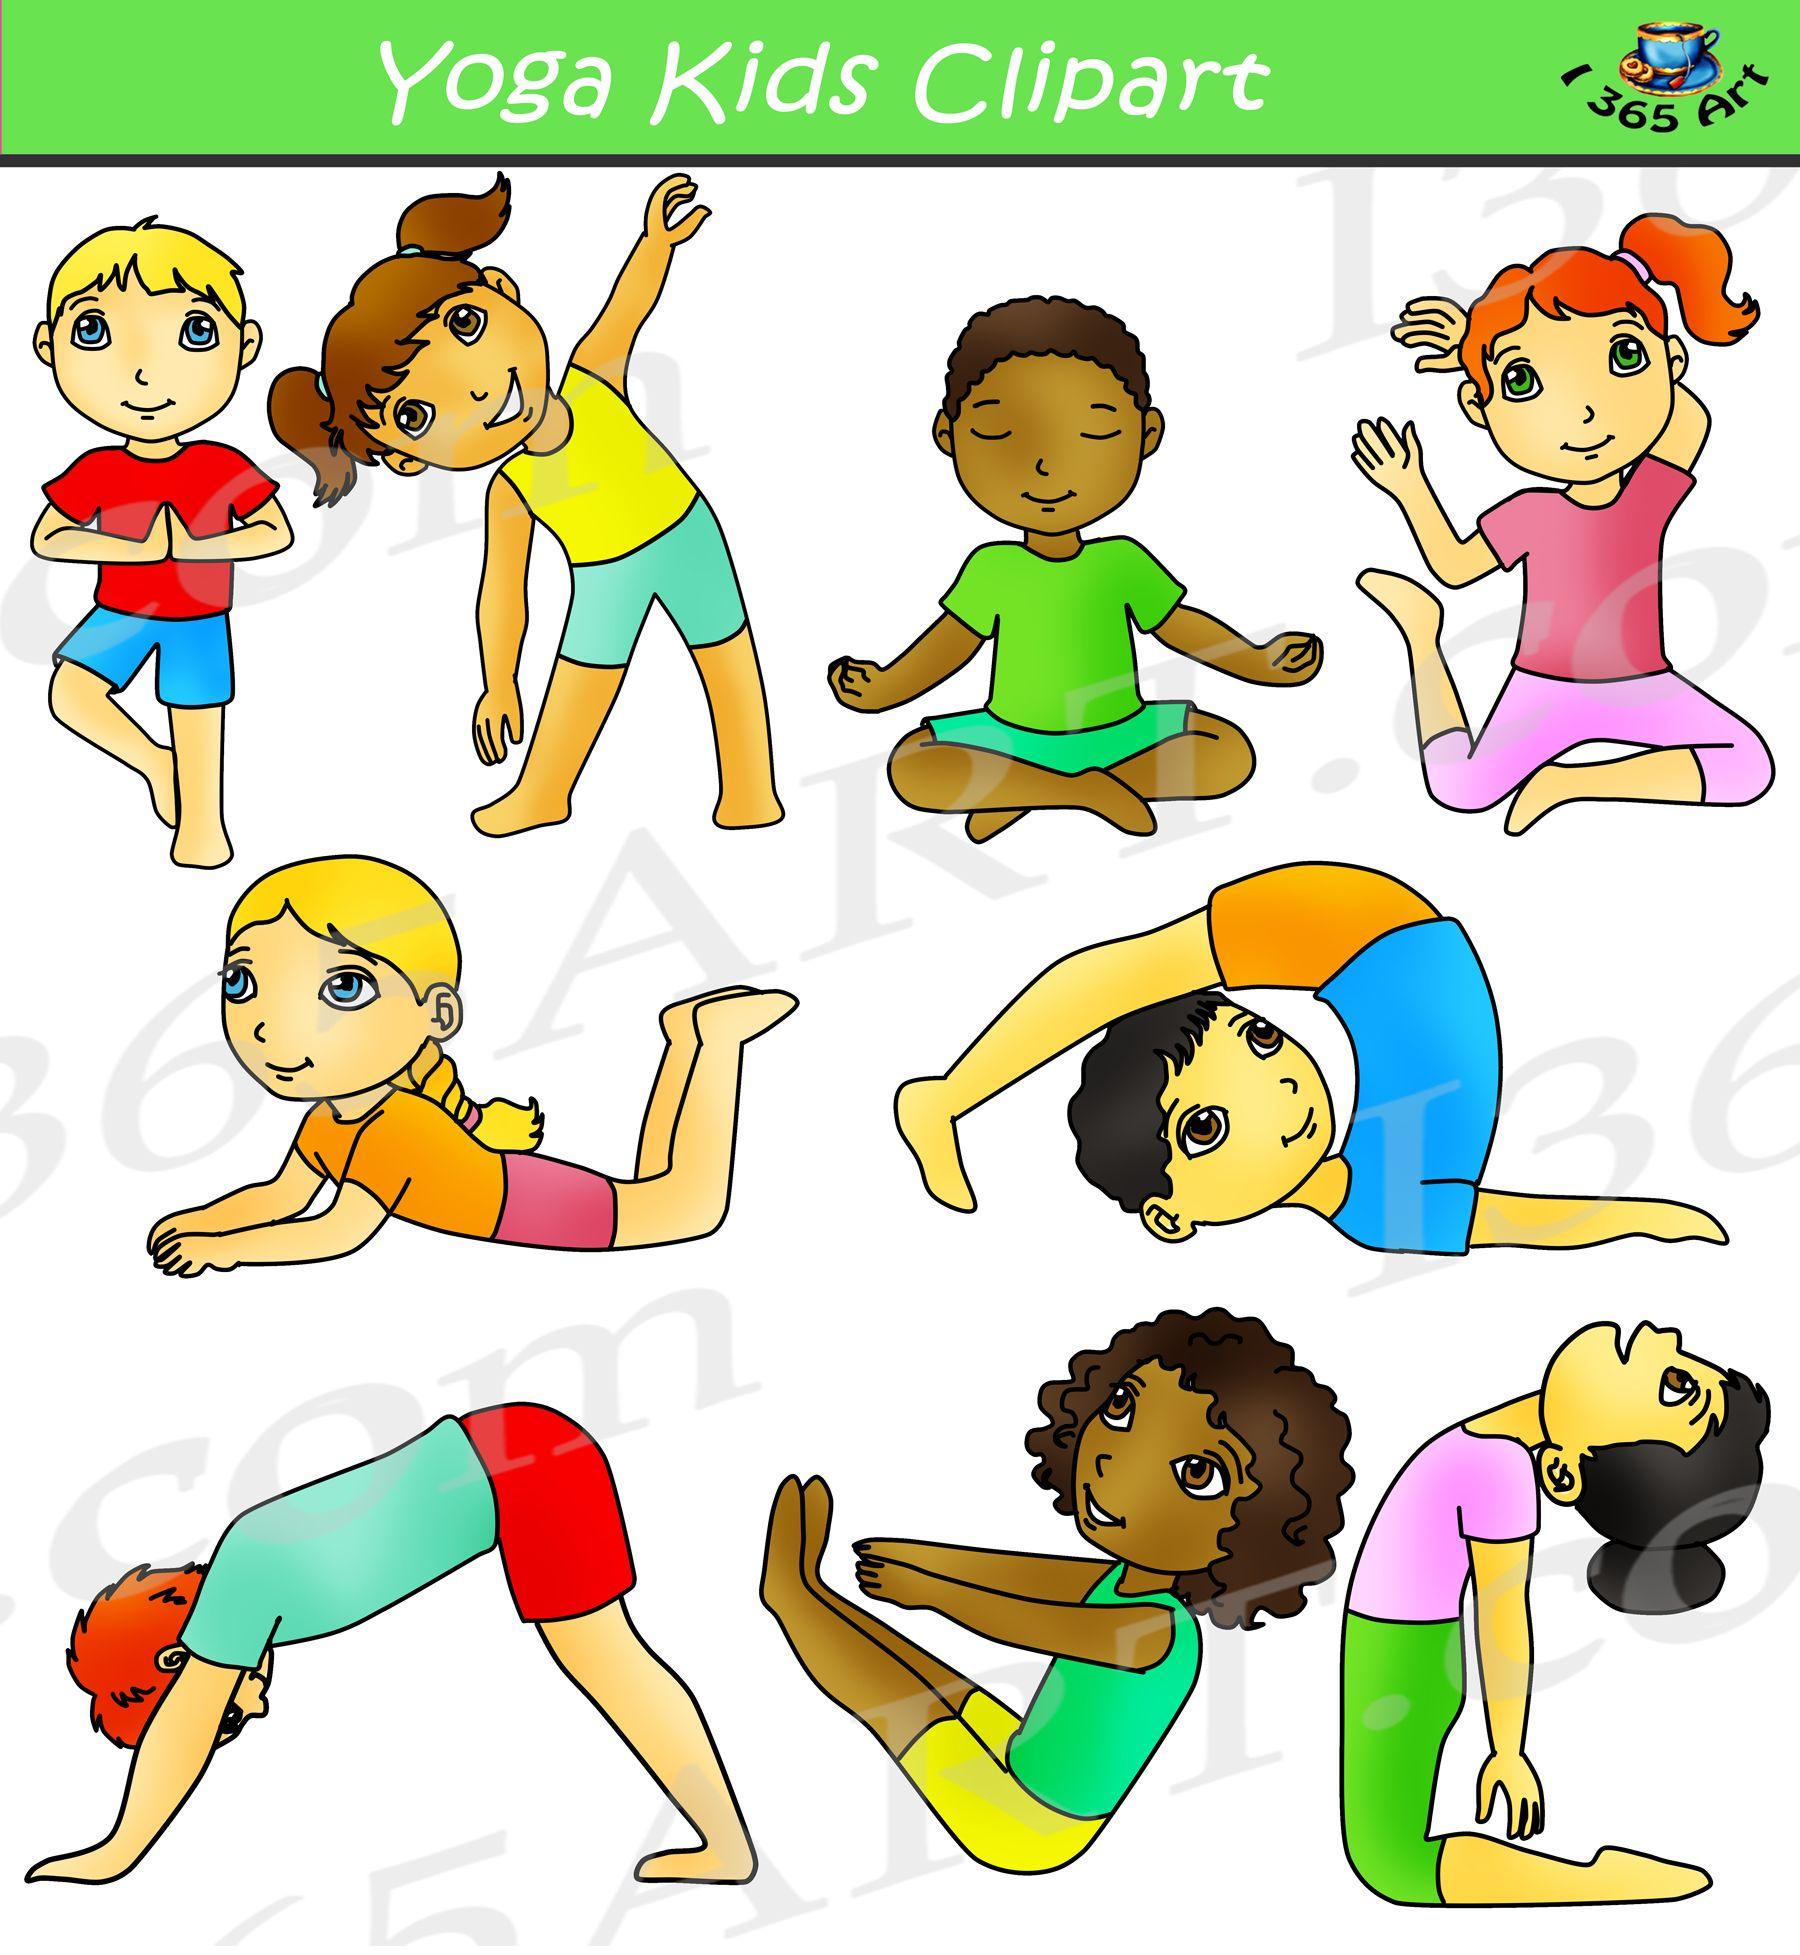 Kids Yoga Clipart Activity Set.